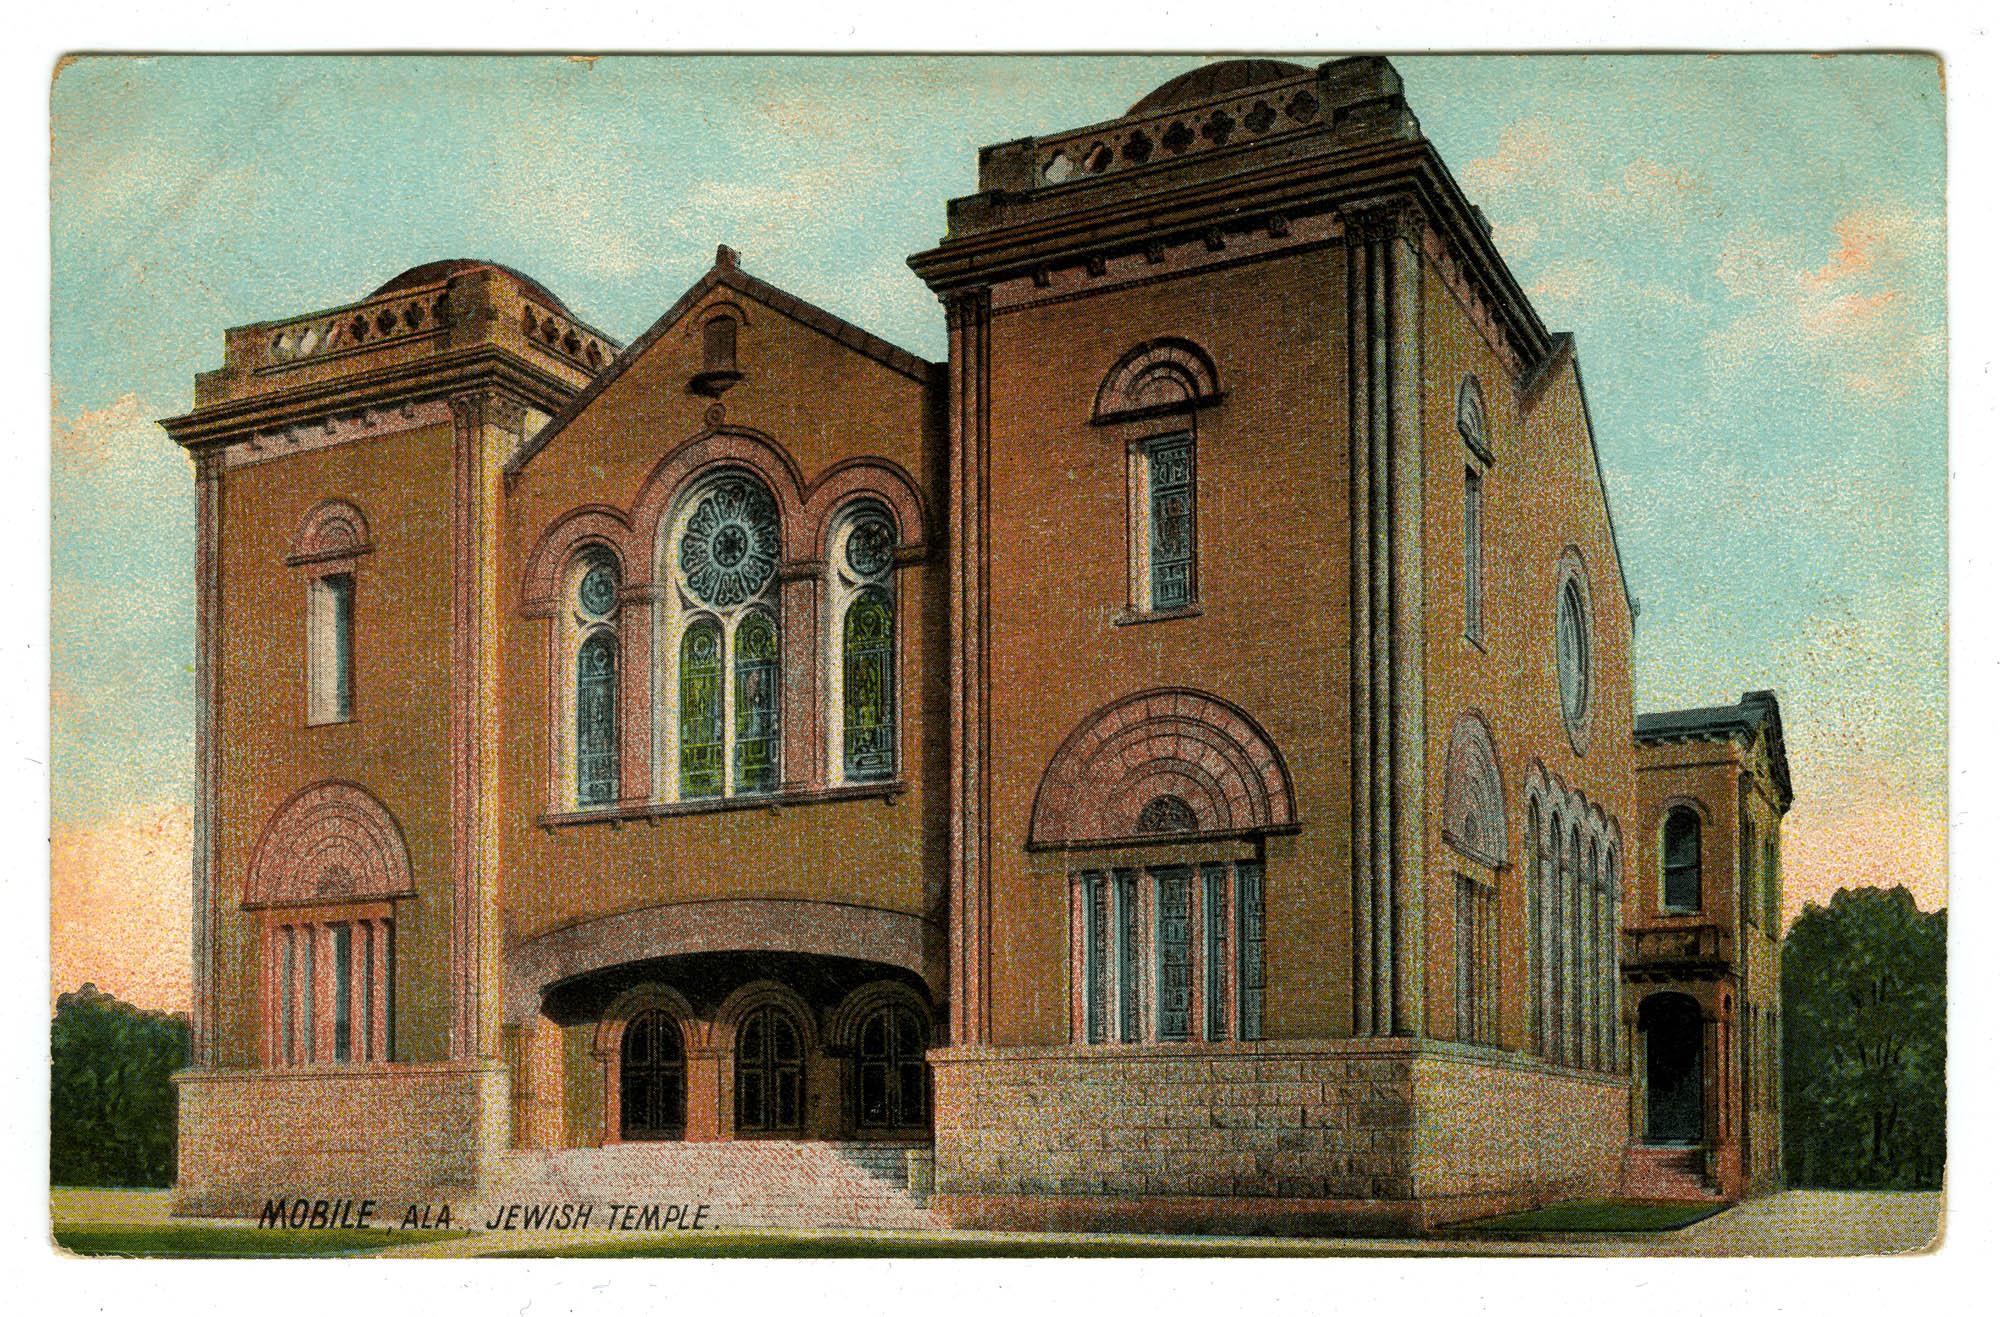 Mobile, Ala., Jewish Temple